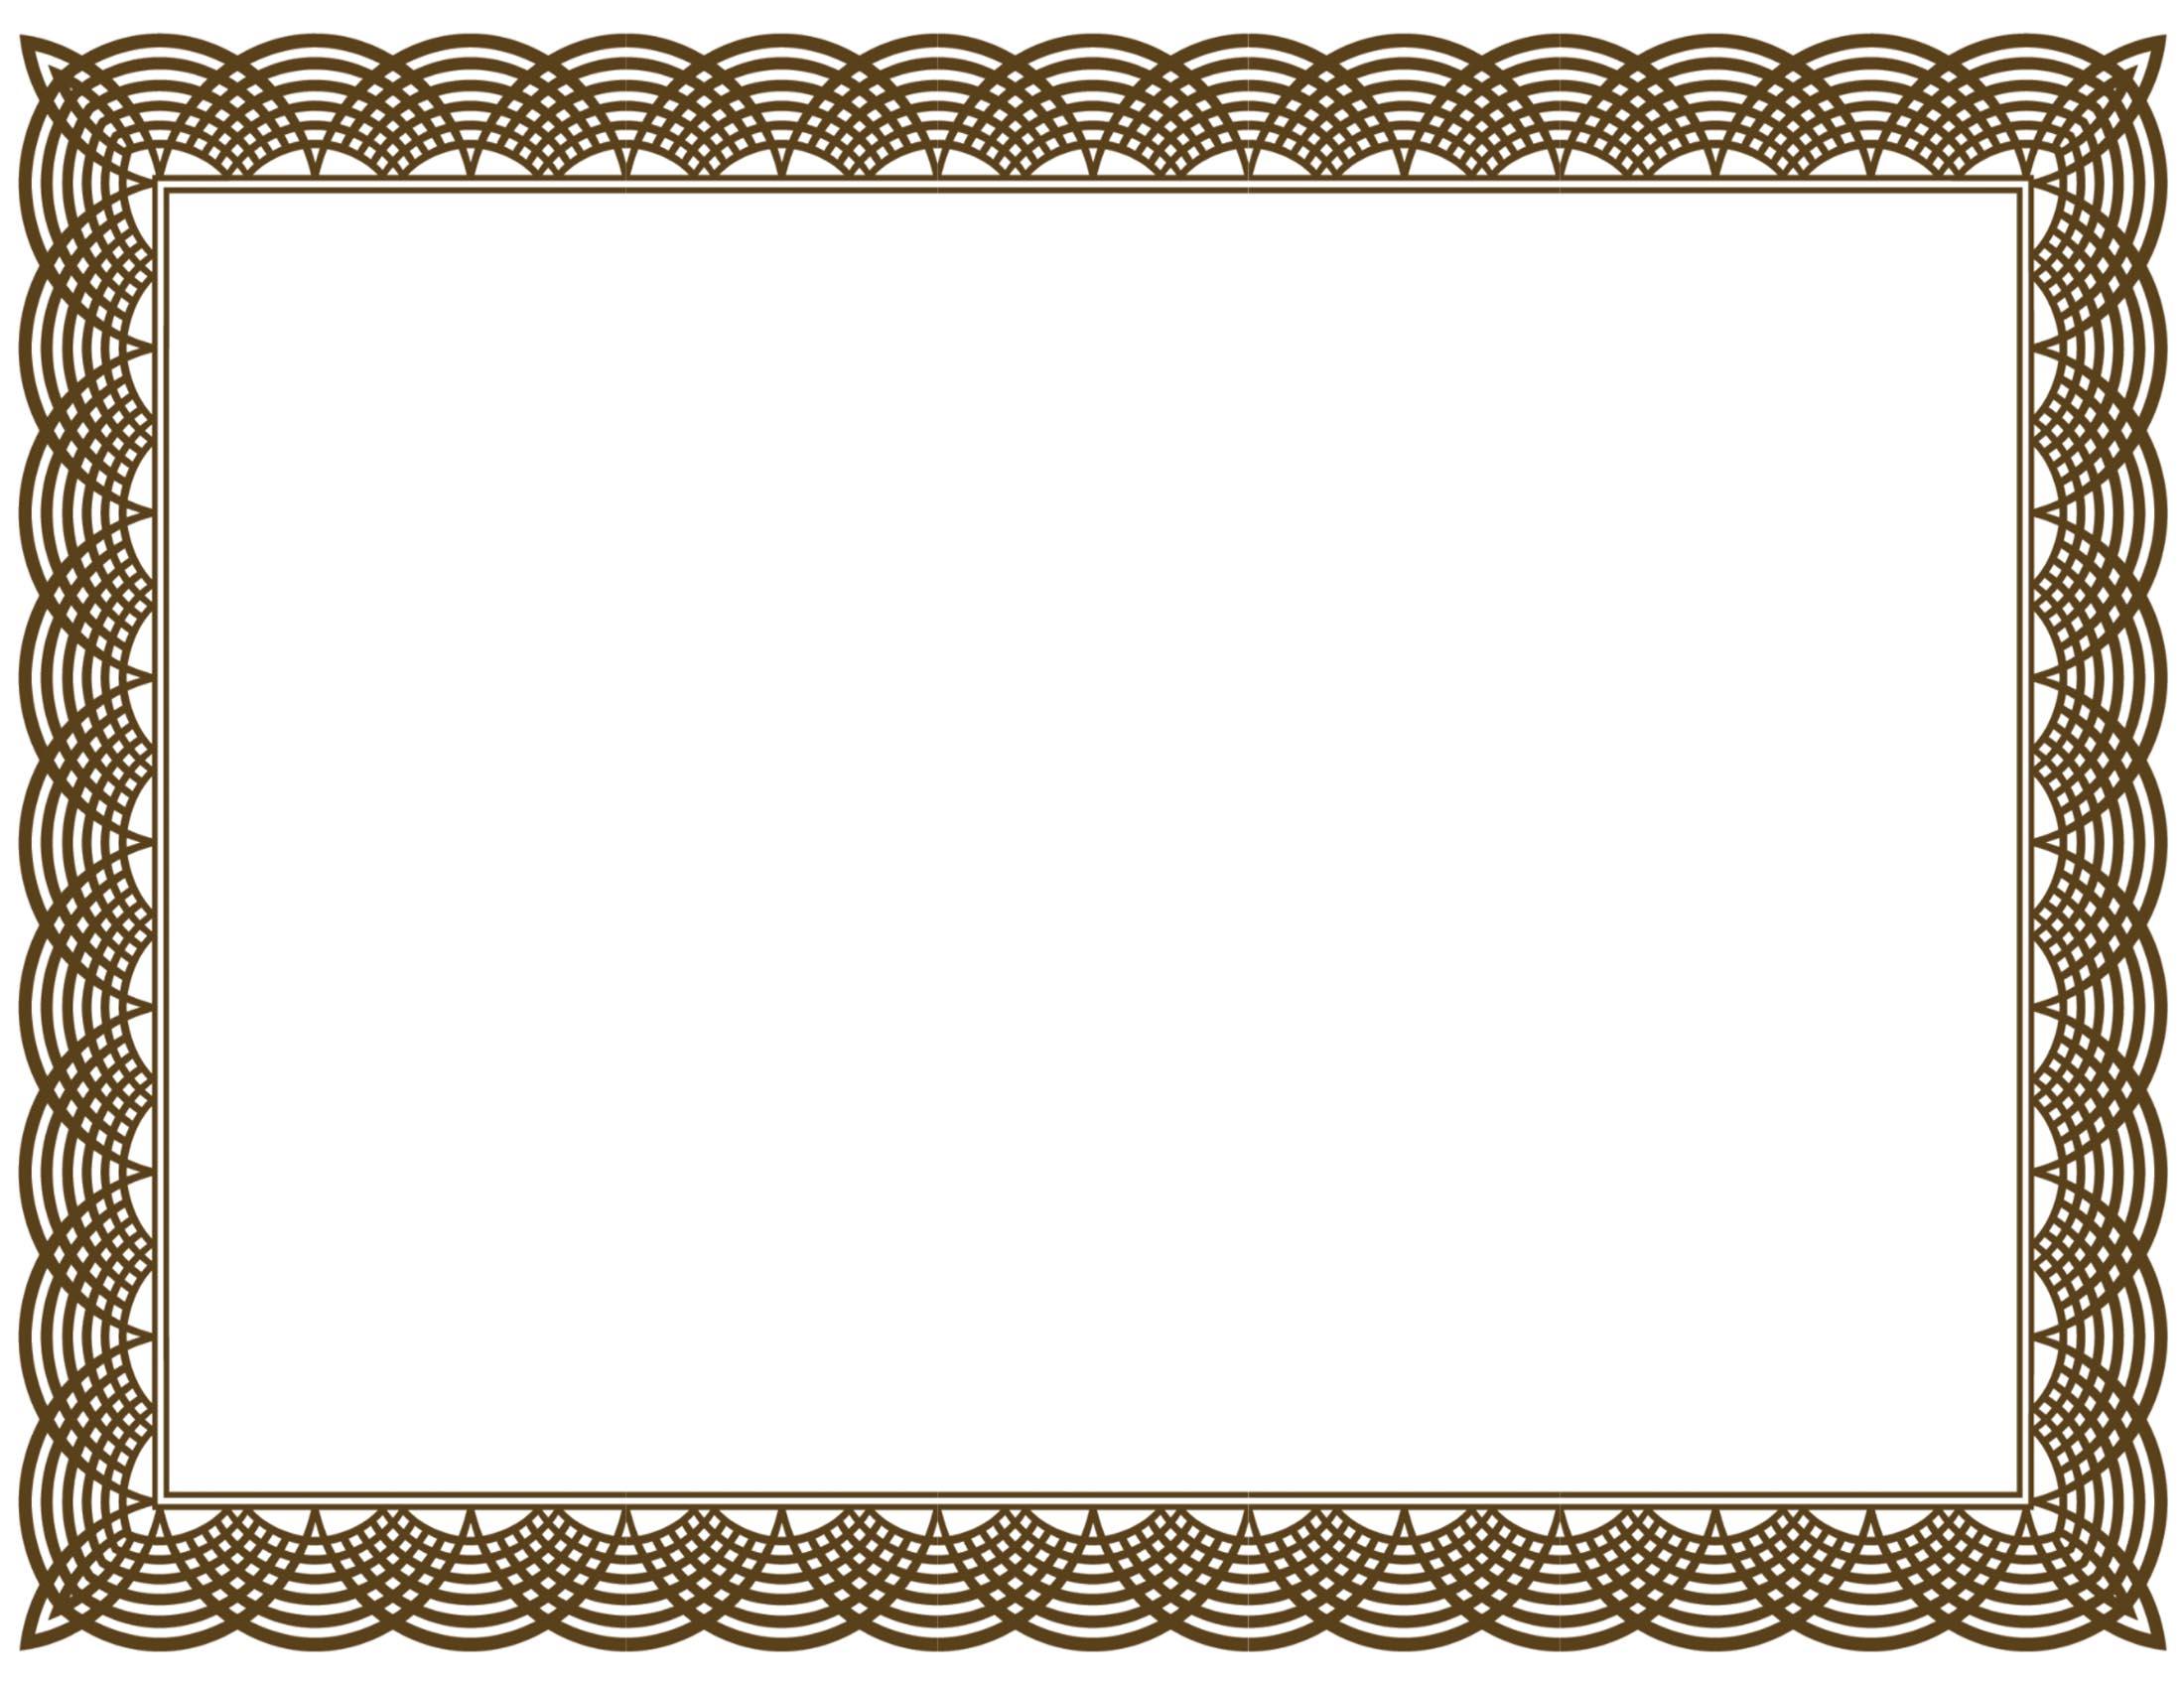 Free Certificate Borders, Download Free Clip Art, Free Clip.